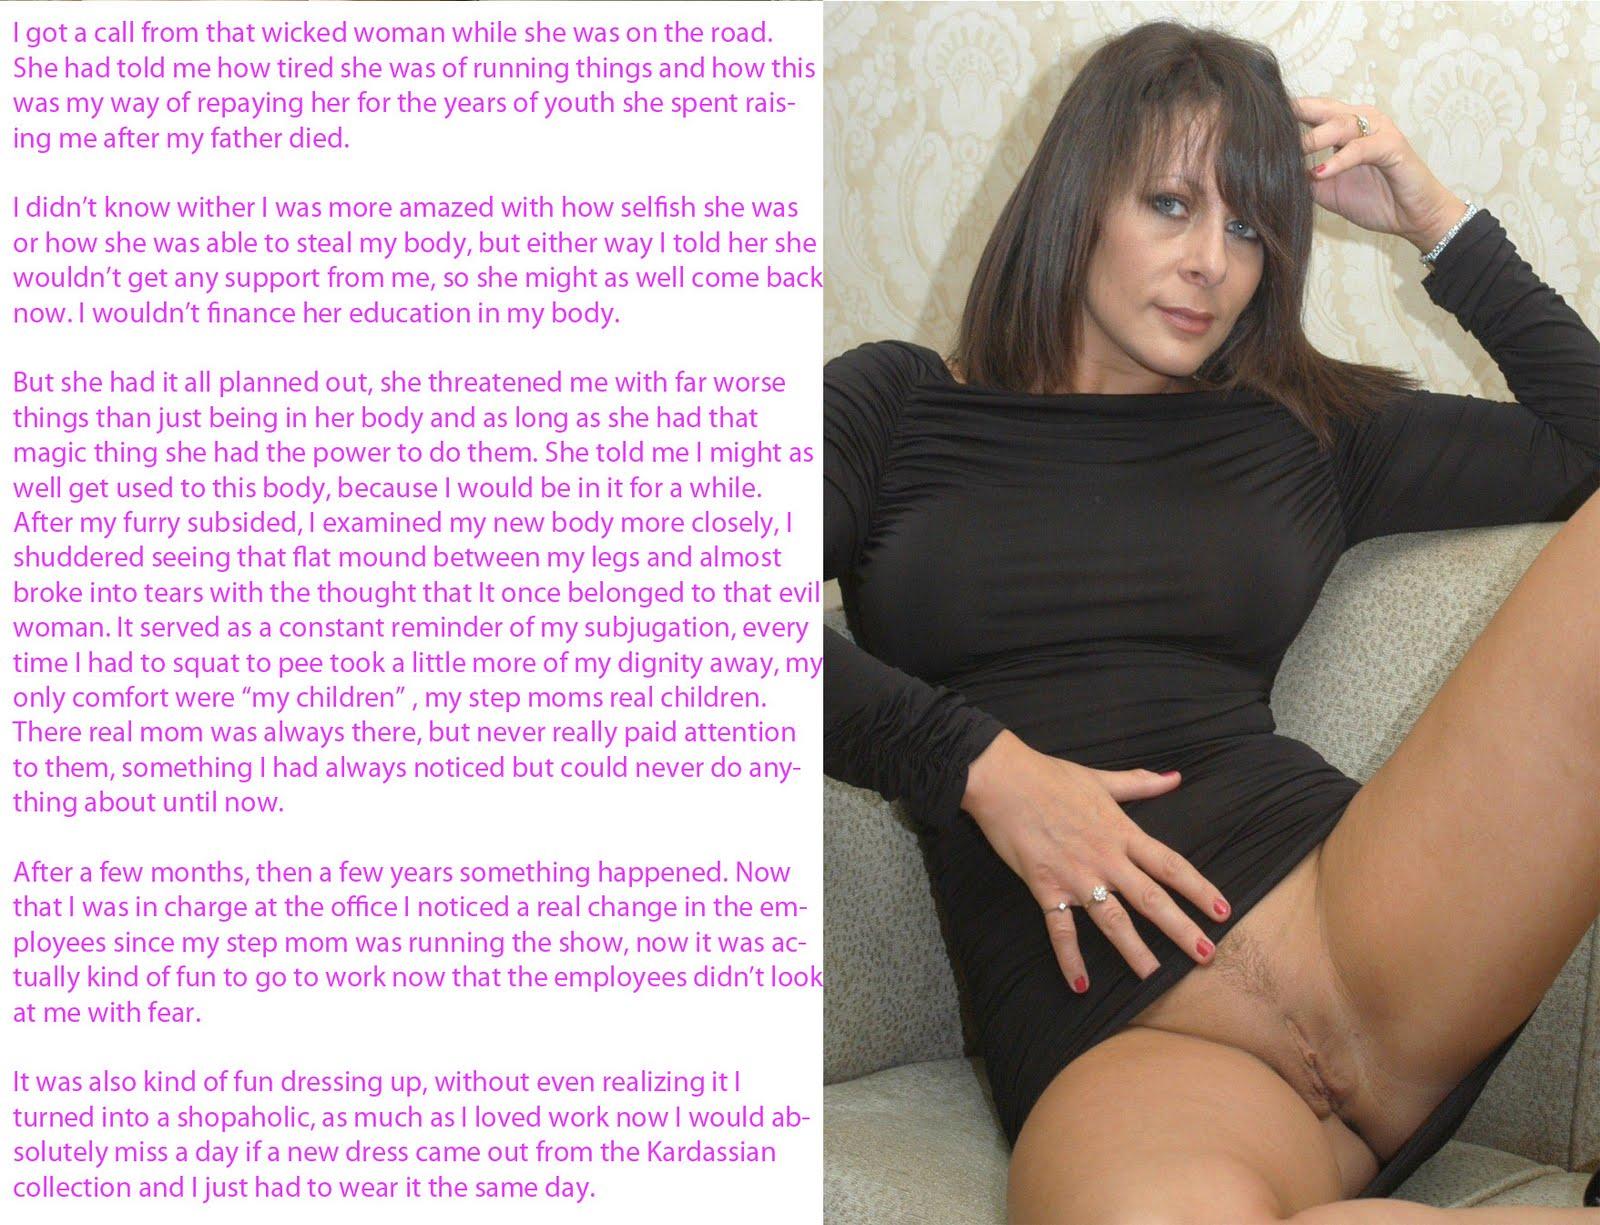 bikini female impersonator stories